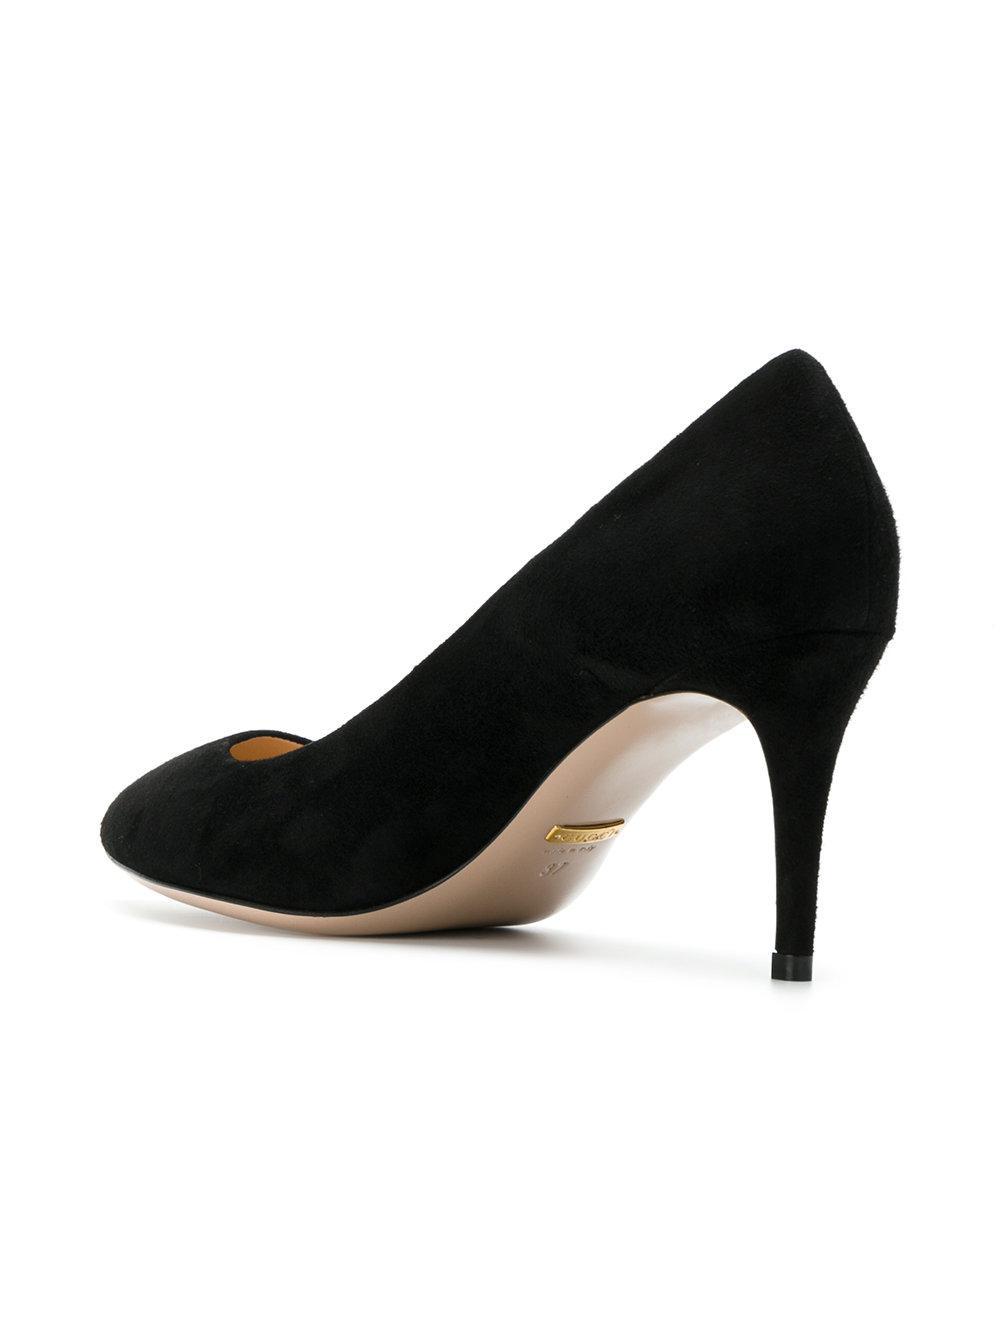 1ac8173ecc Gucci - Black Classic Pointed Toe Pumps - Lyst. View fullscreen